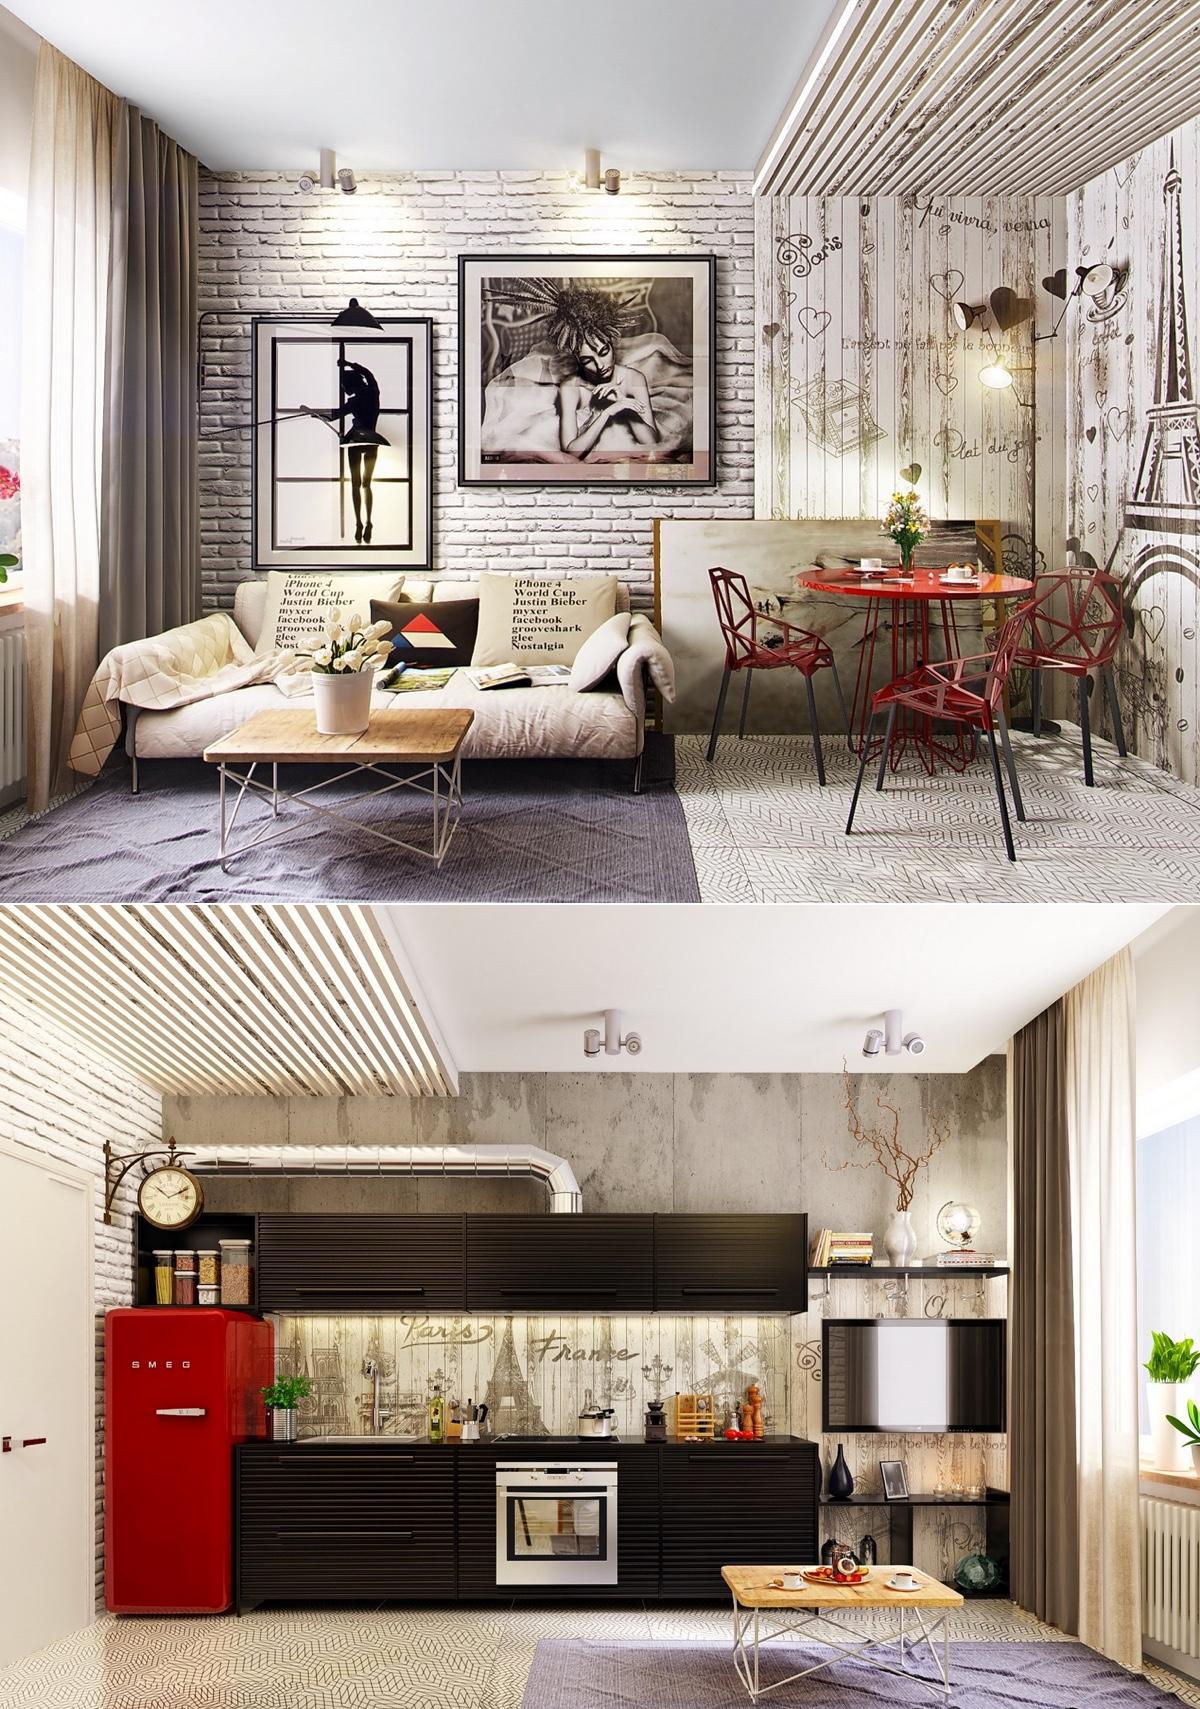 Custom Room Design Online: 25 Industrial Living Rooms Design Ideas